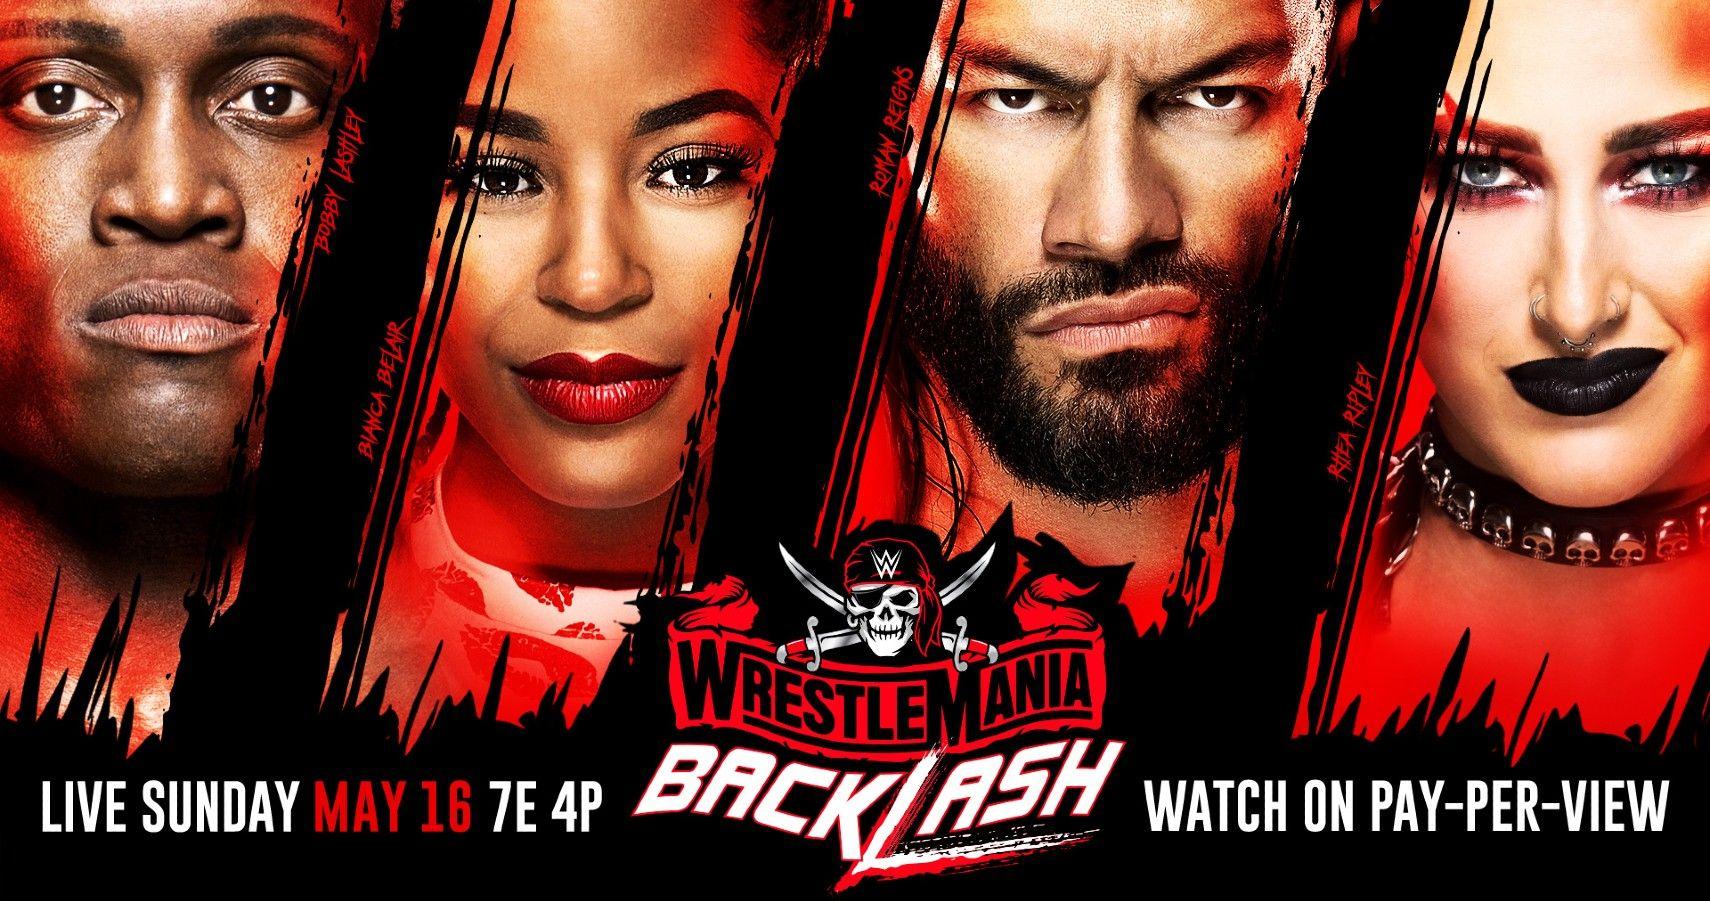 WWE WrestleMania Backlash 2021 Predictions | TheSportster